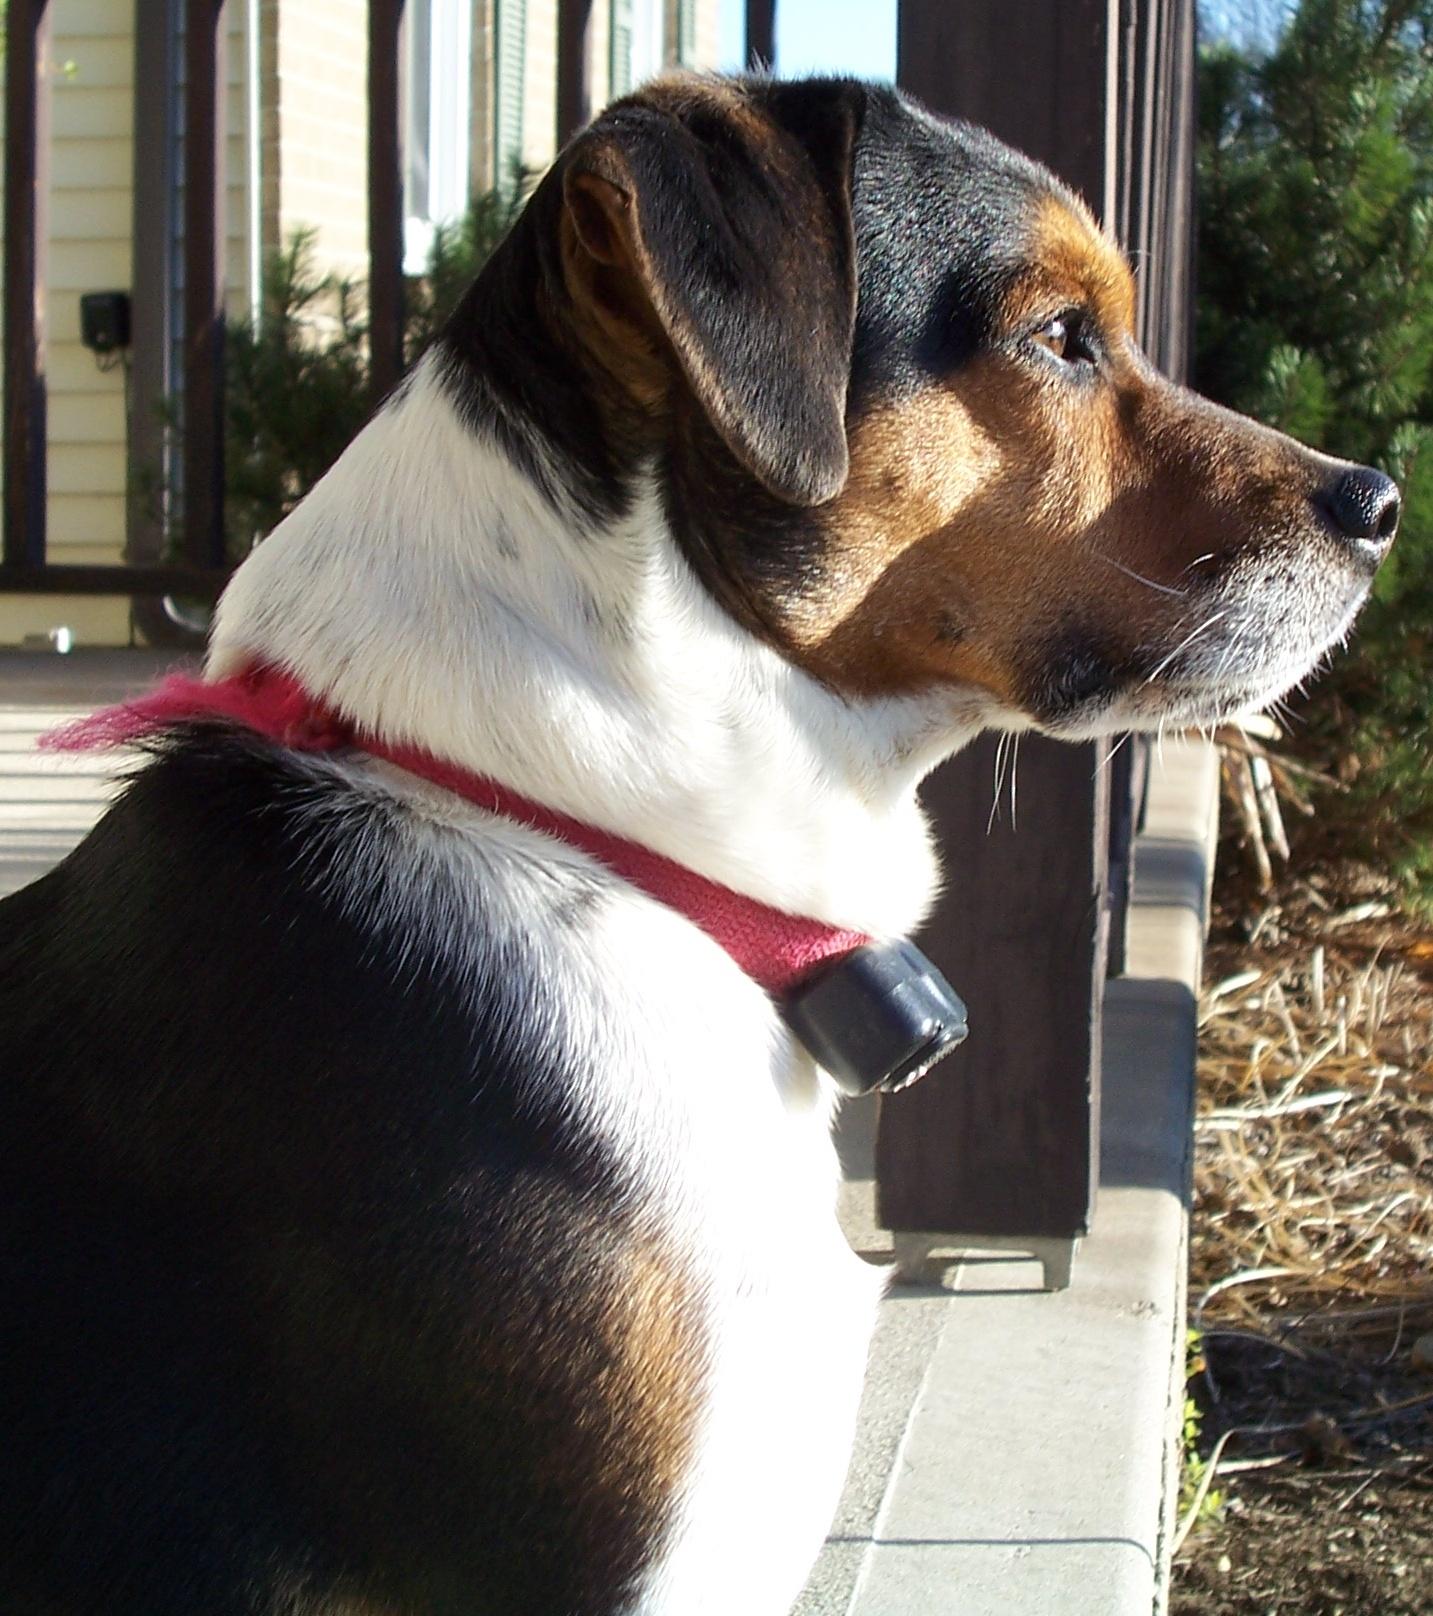 On Guard, Animal, Bspo06, Collar, Dog, HQ Photo